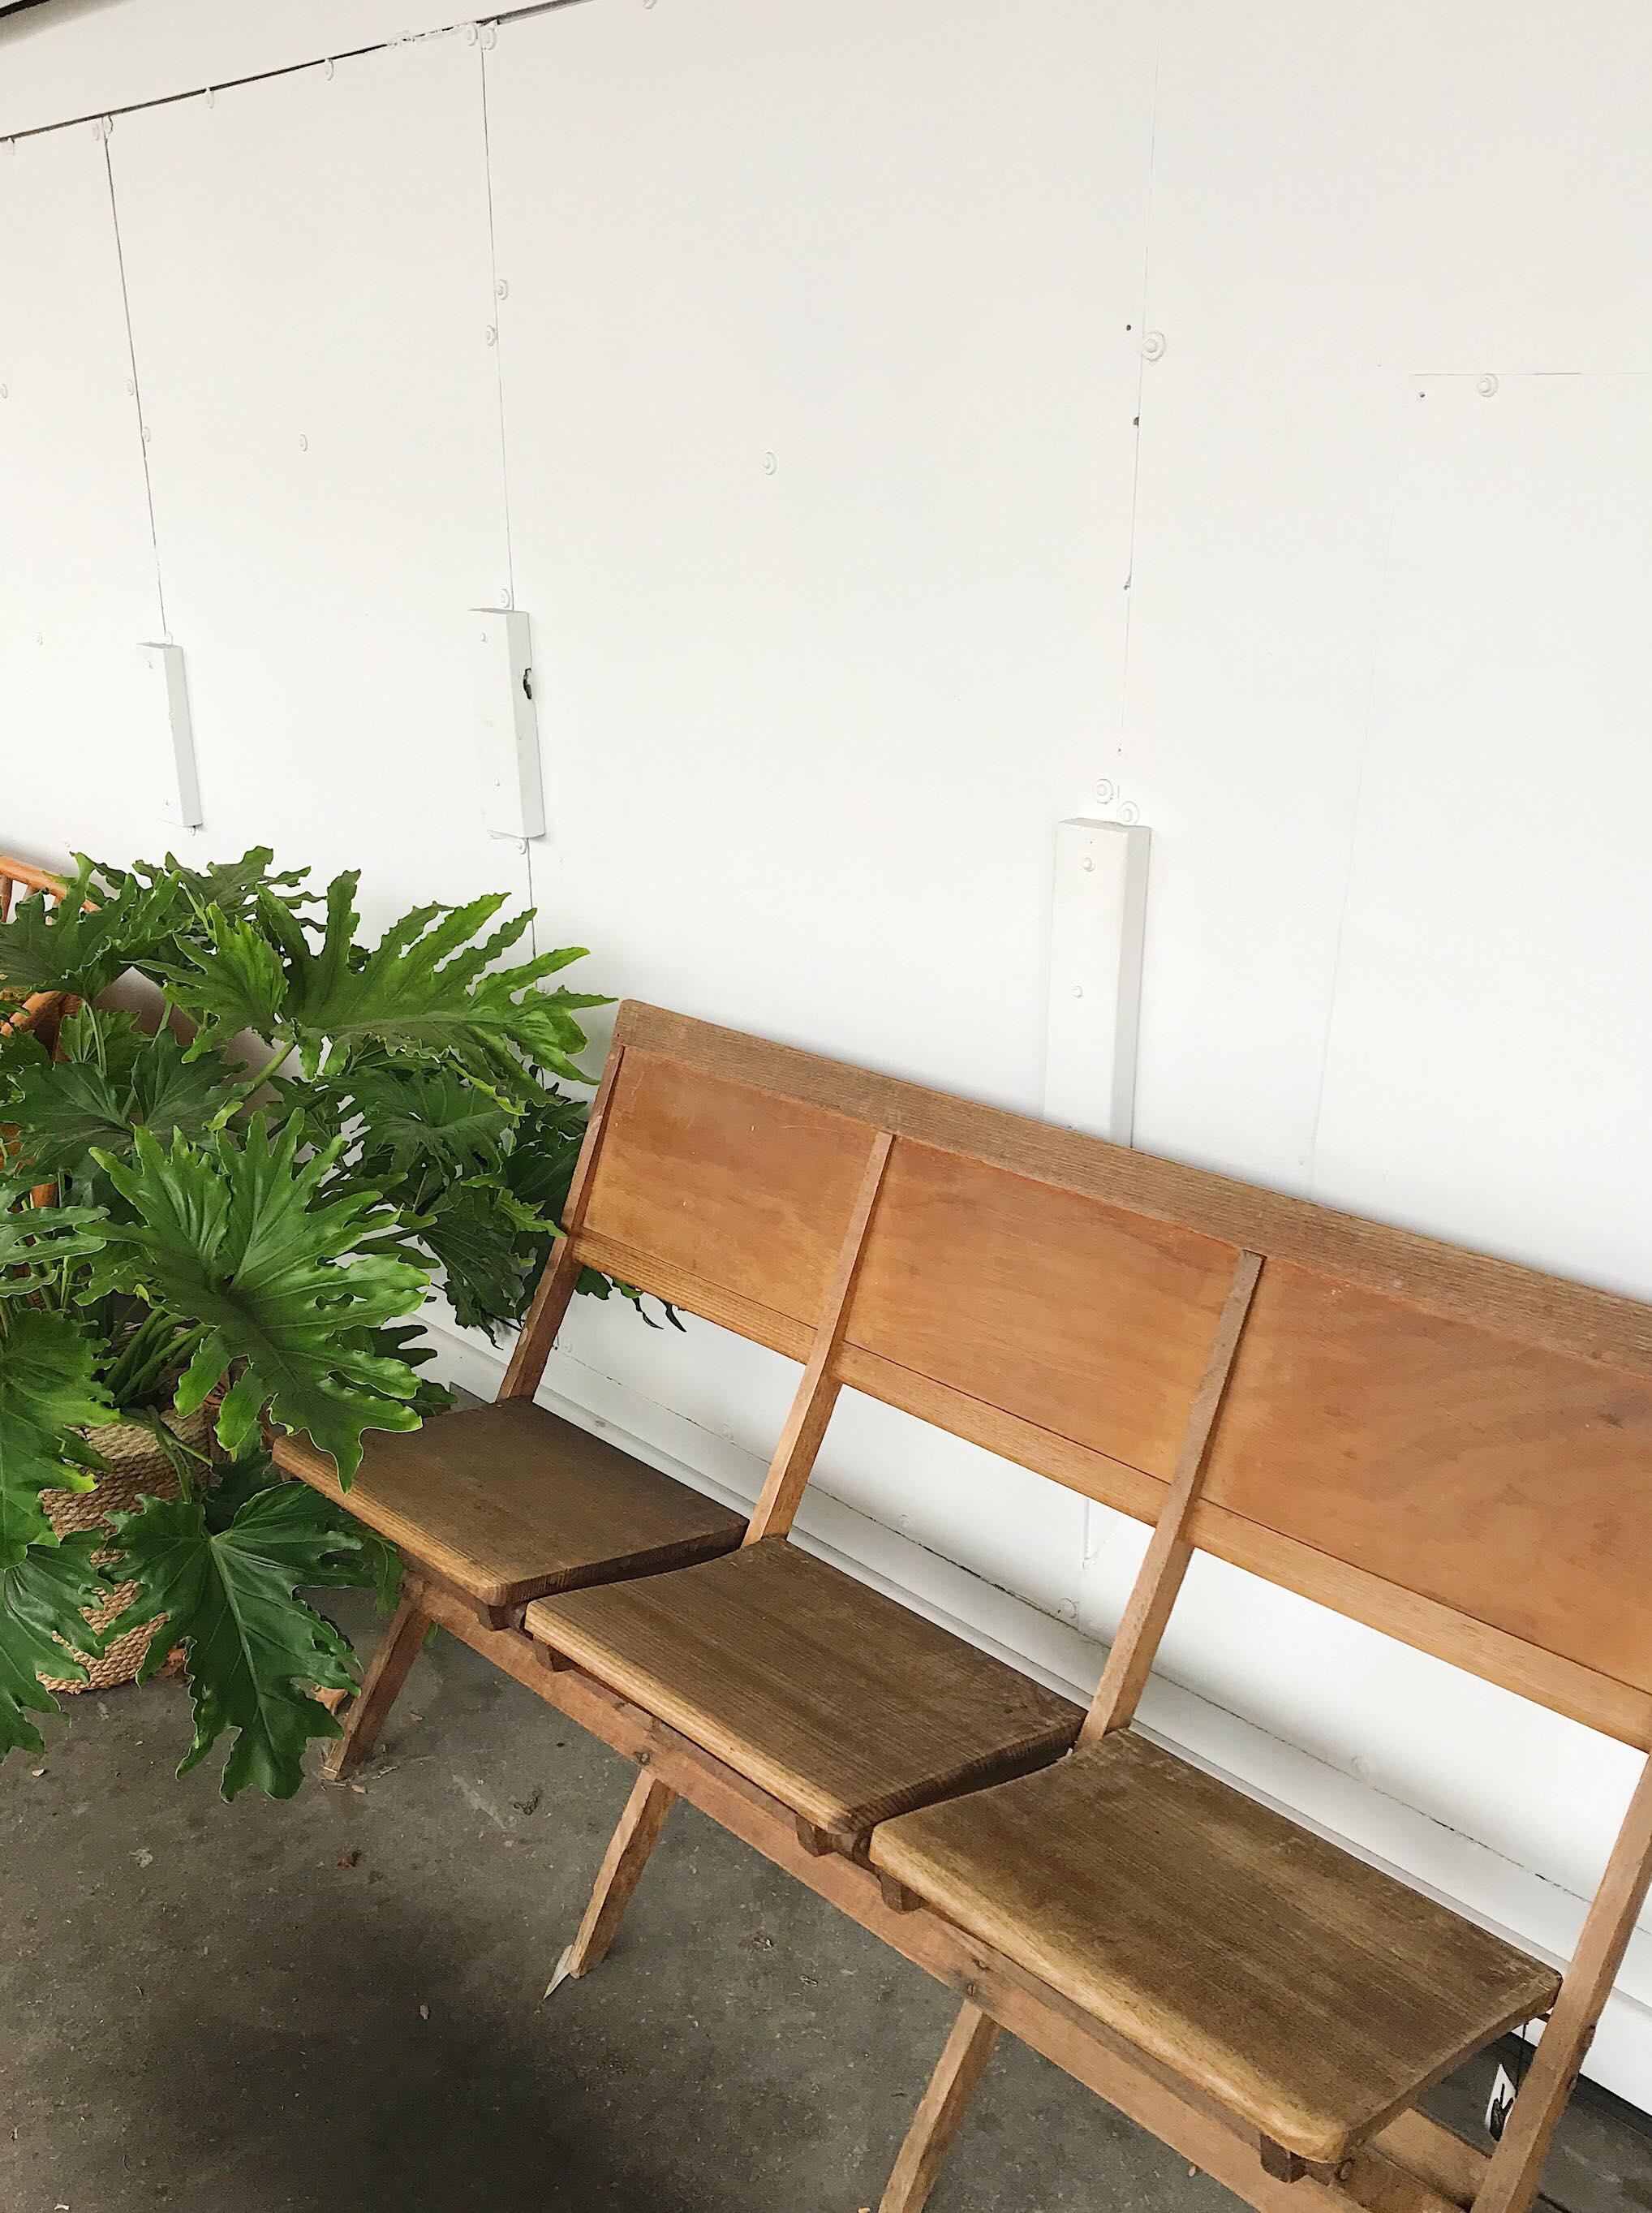 3 Seater Cinema Chairs